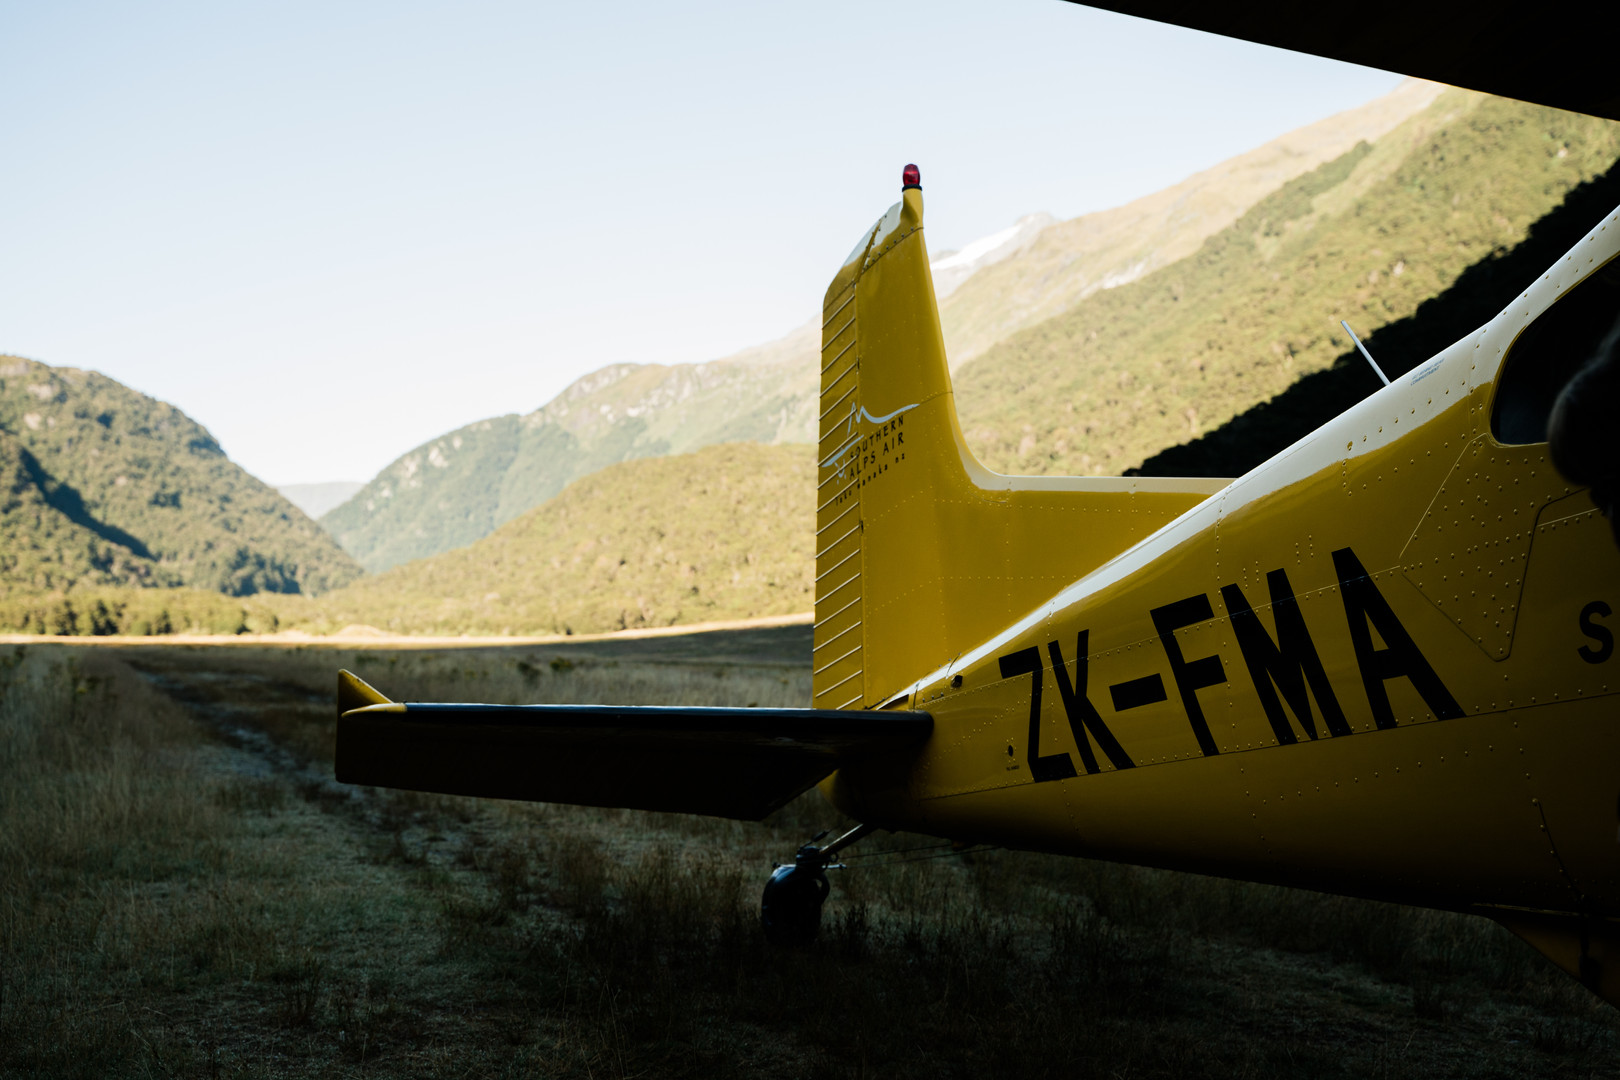 NZ MTB X Wanaka fnls lrg-201.jpg